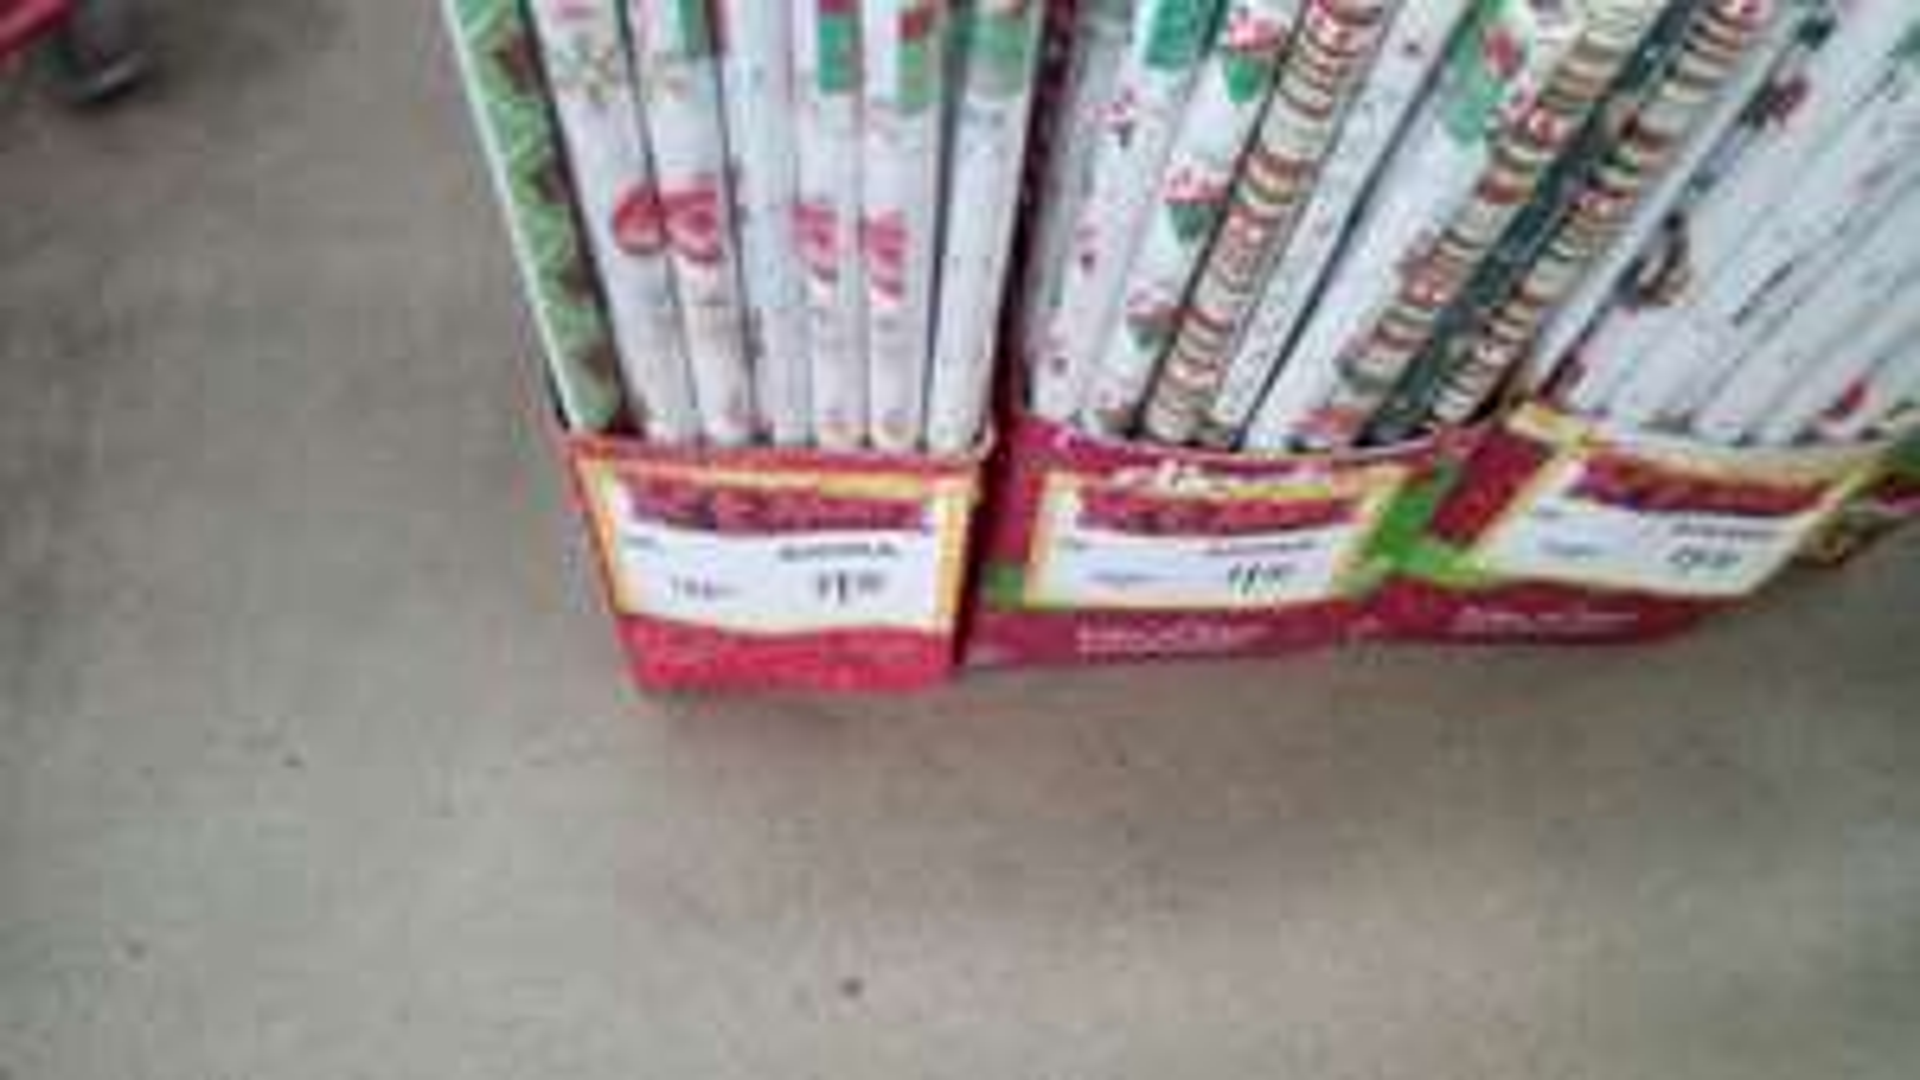 Bodega Aurrerá: Papel o forro de Navidad de 22 a 1 y de 10 a 1